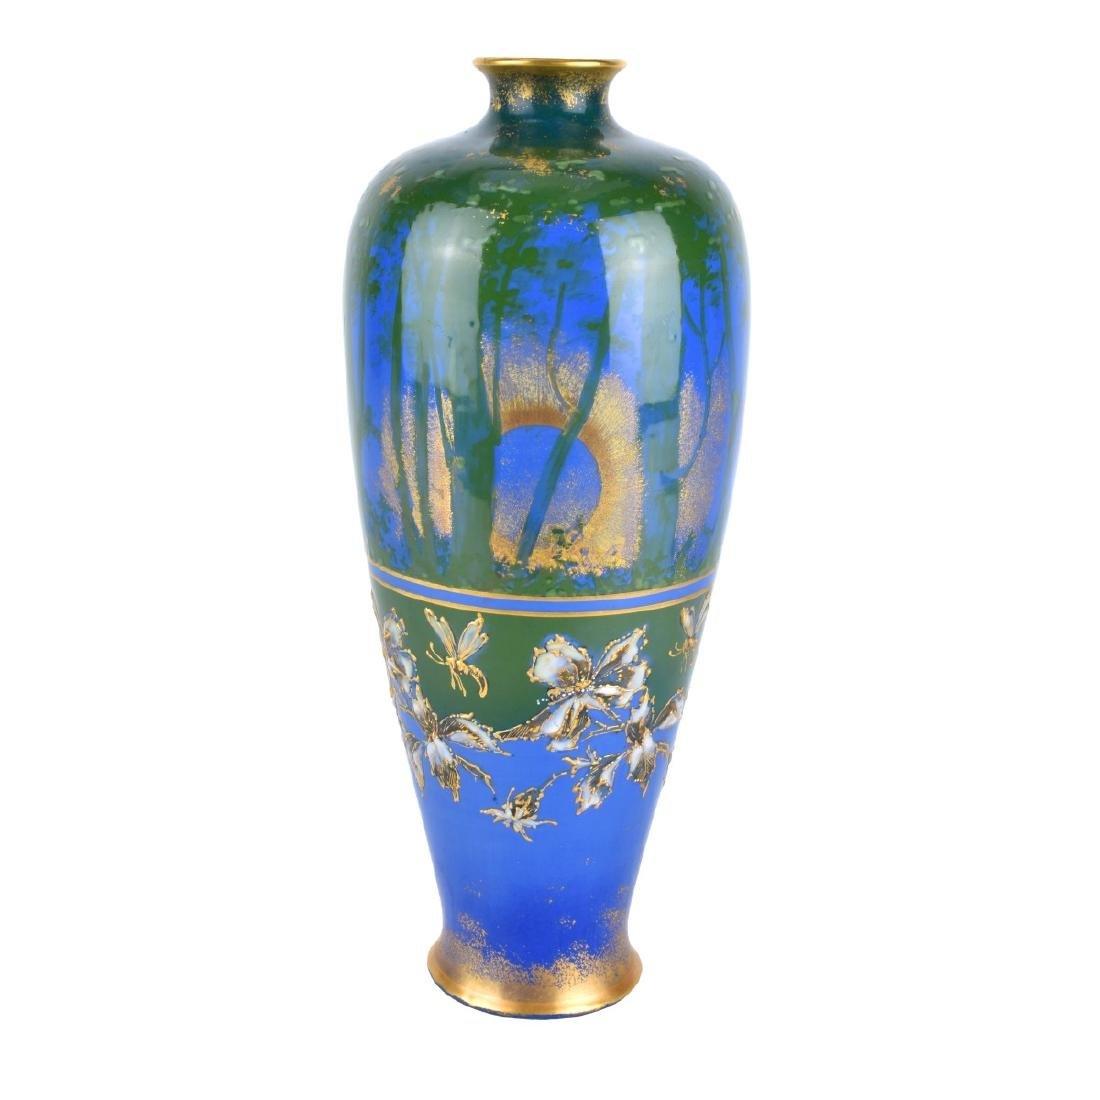 Turn Teplitz Amphora Woodland and Rising Sun Vase